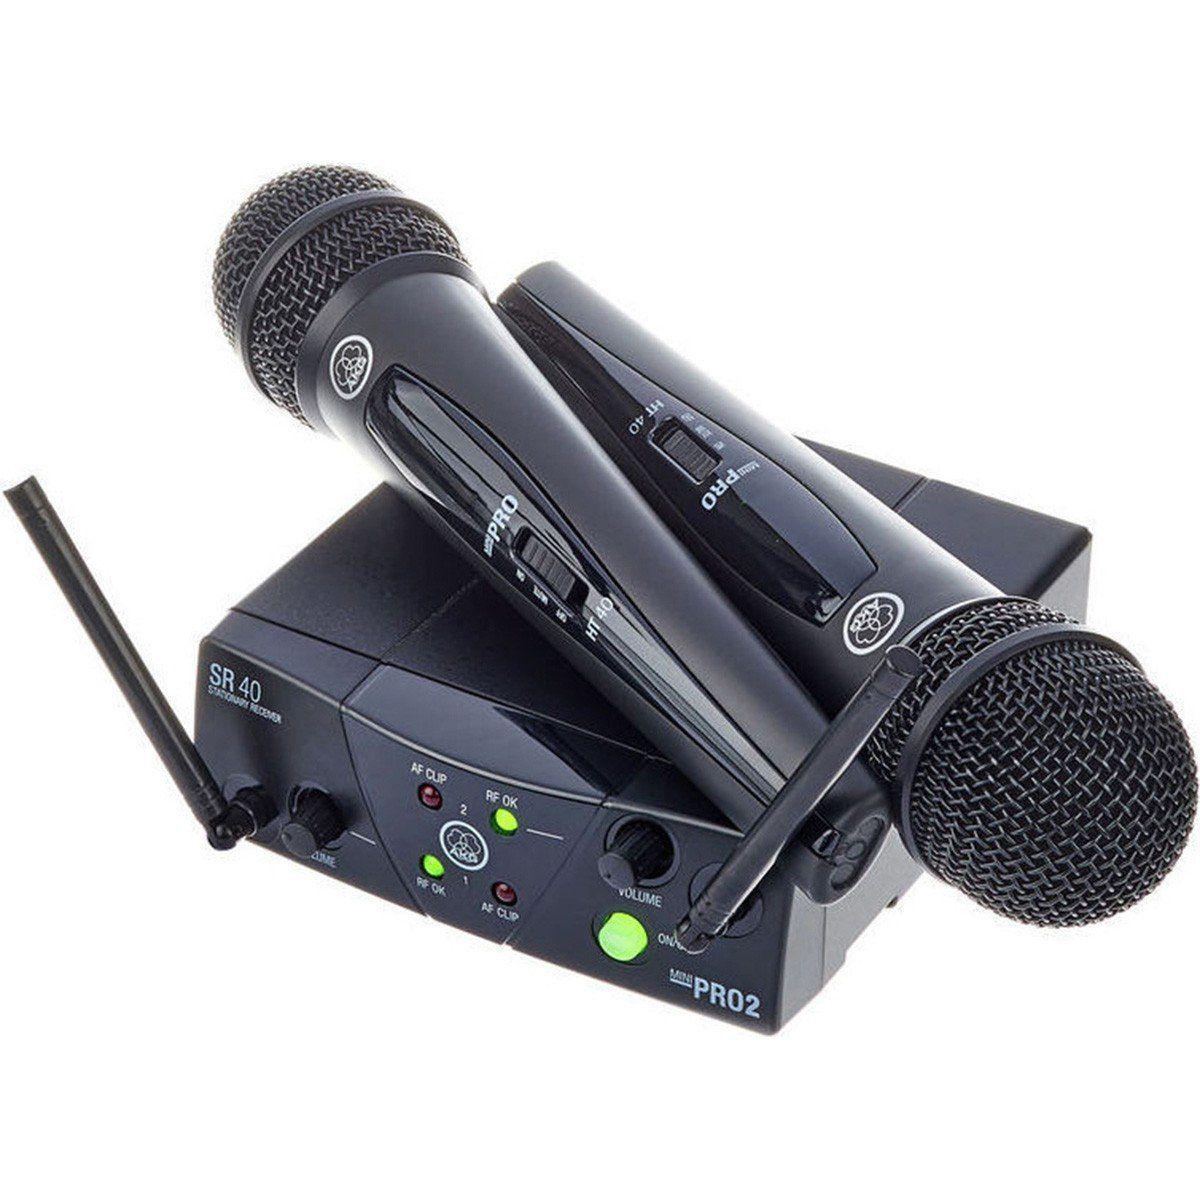 Akg WMS40 Mini Dual Vocal Set Microfone Sem Fio Akg WMS-40 Mini Duplo Vocal Set